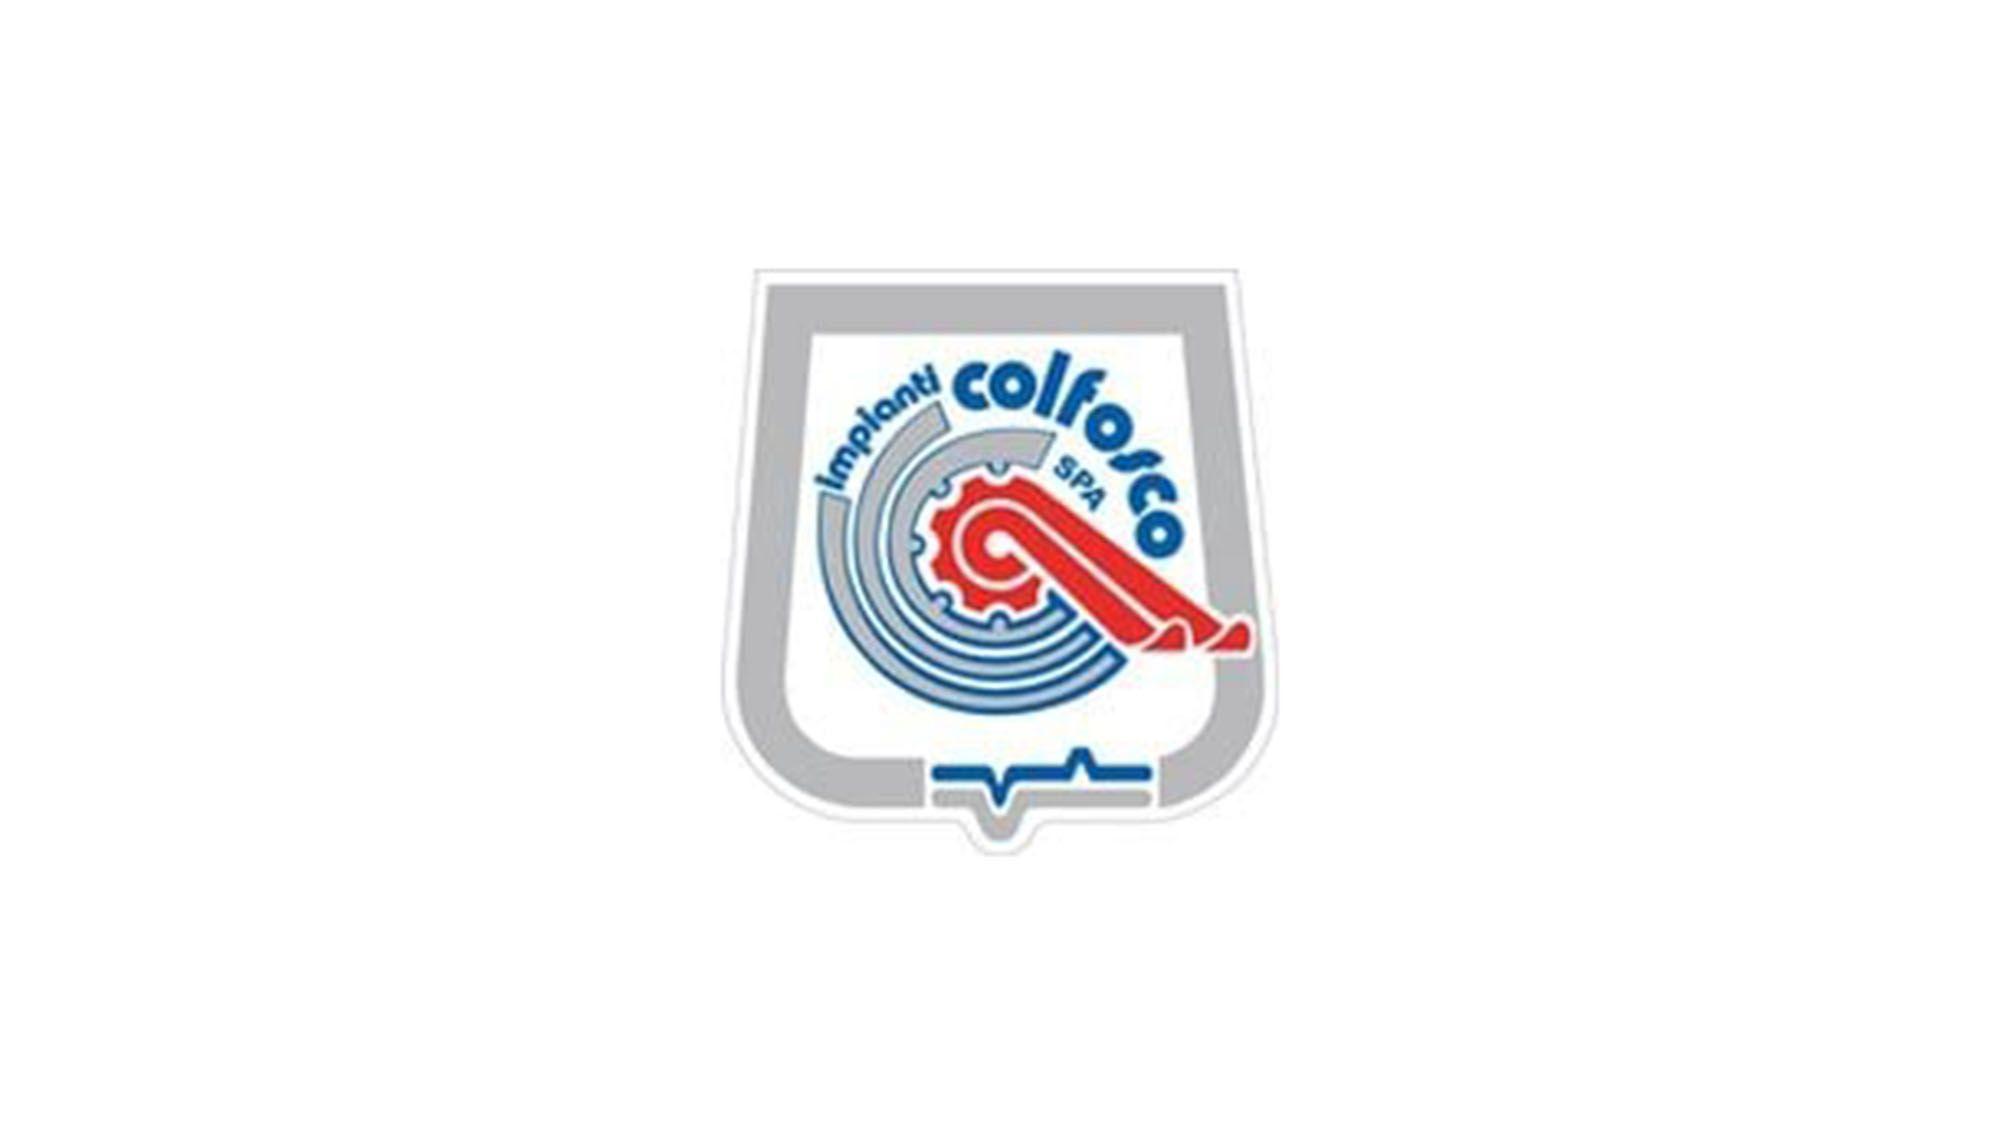 Impianti Colfosco Logo